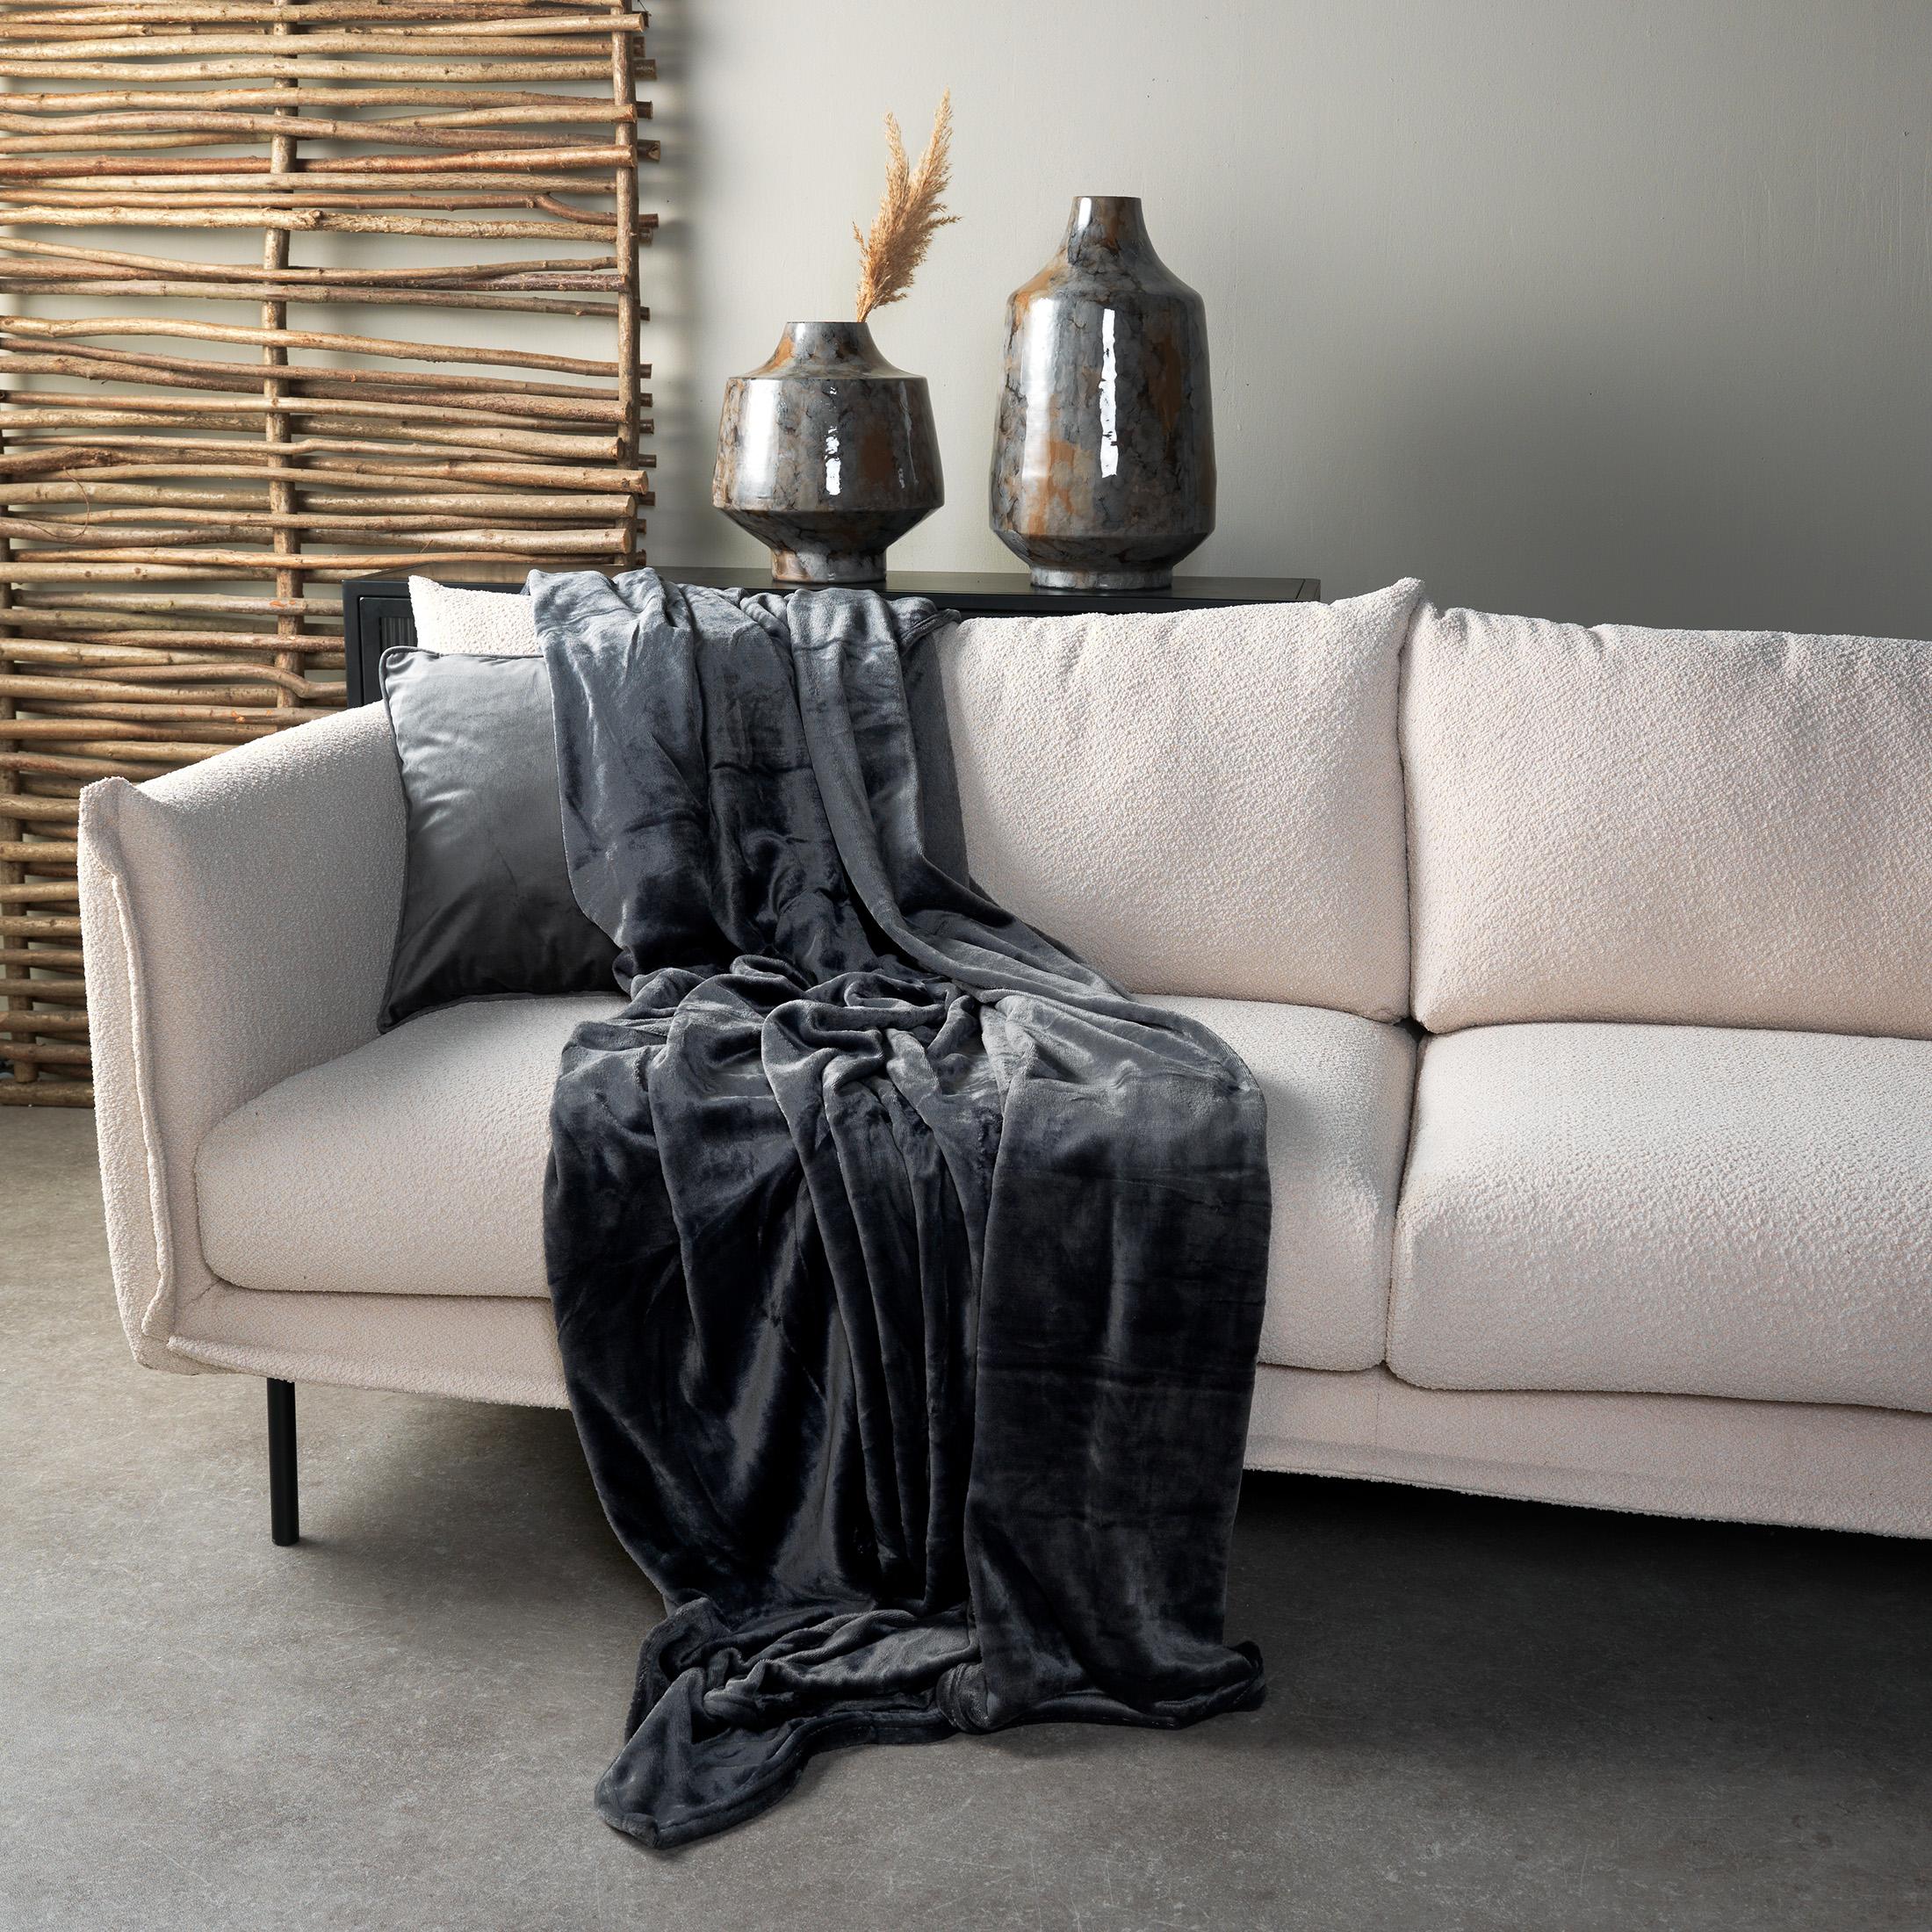 CHARLIE - Plaid Charcoal Grey 200x220 cm